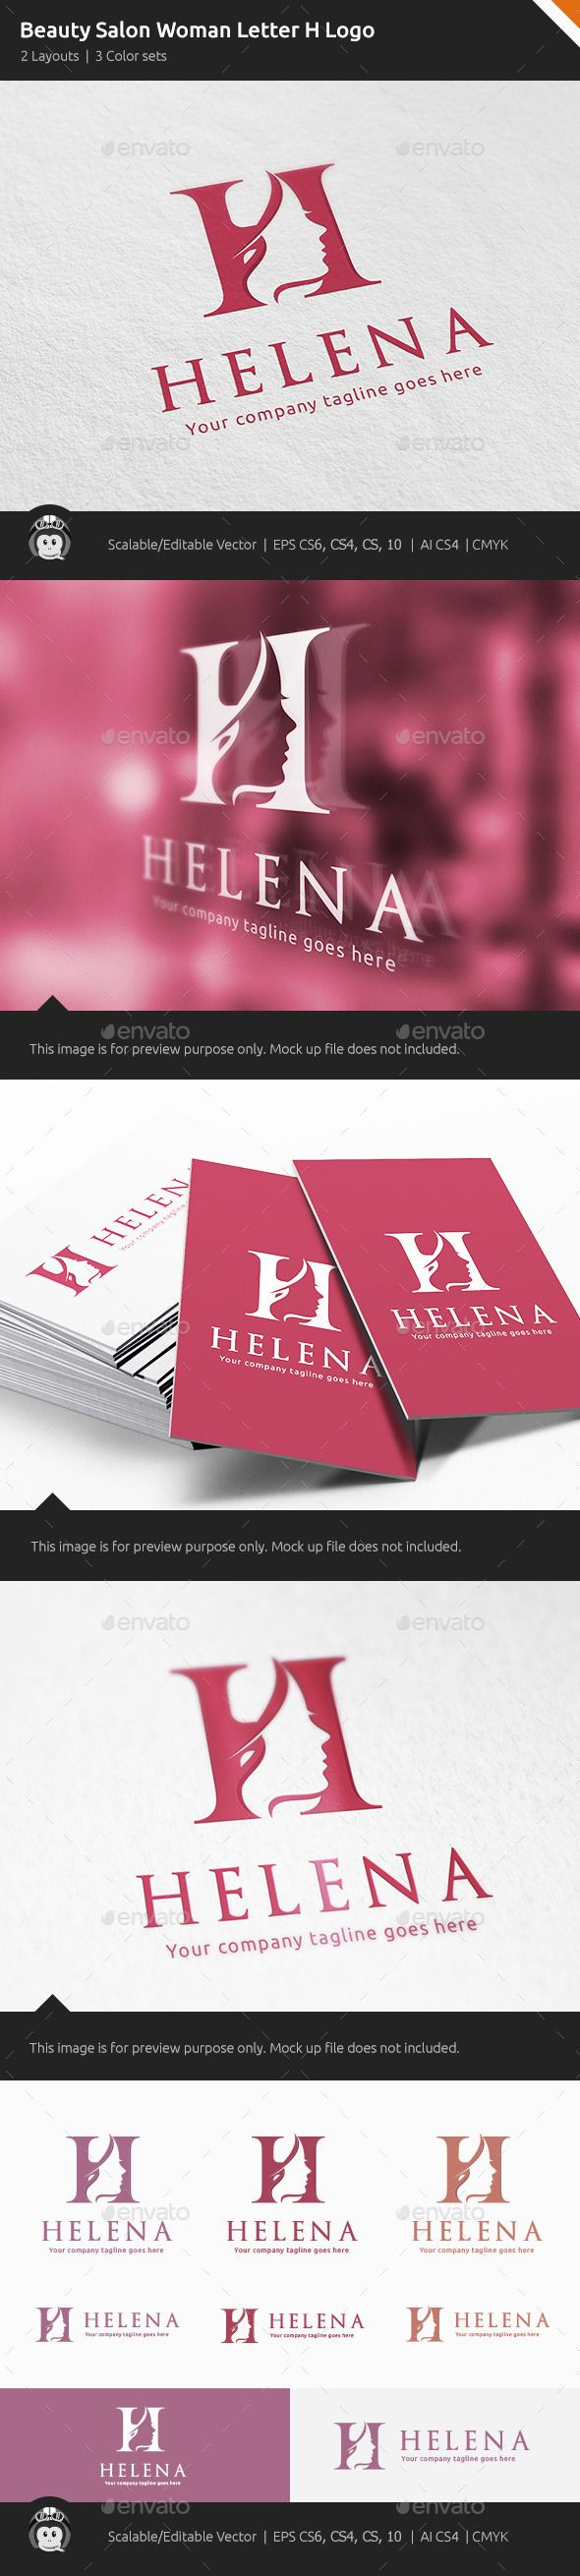 Beauty Salon Woman Letter H - Logo Design Template Vector #logotype Download it here: http://graphicriver.net/item/beauty-salon-woman-letter-h-logo/11262899?s_rank=458?ref=nexion